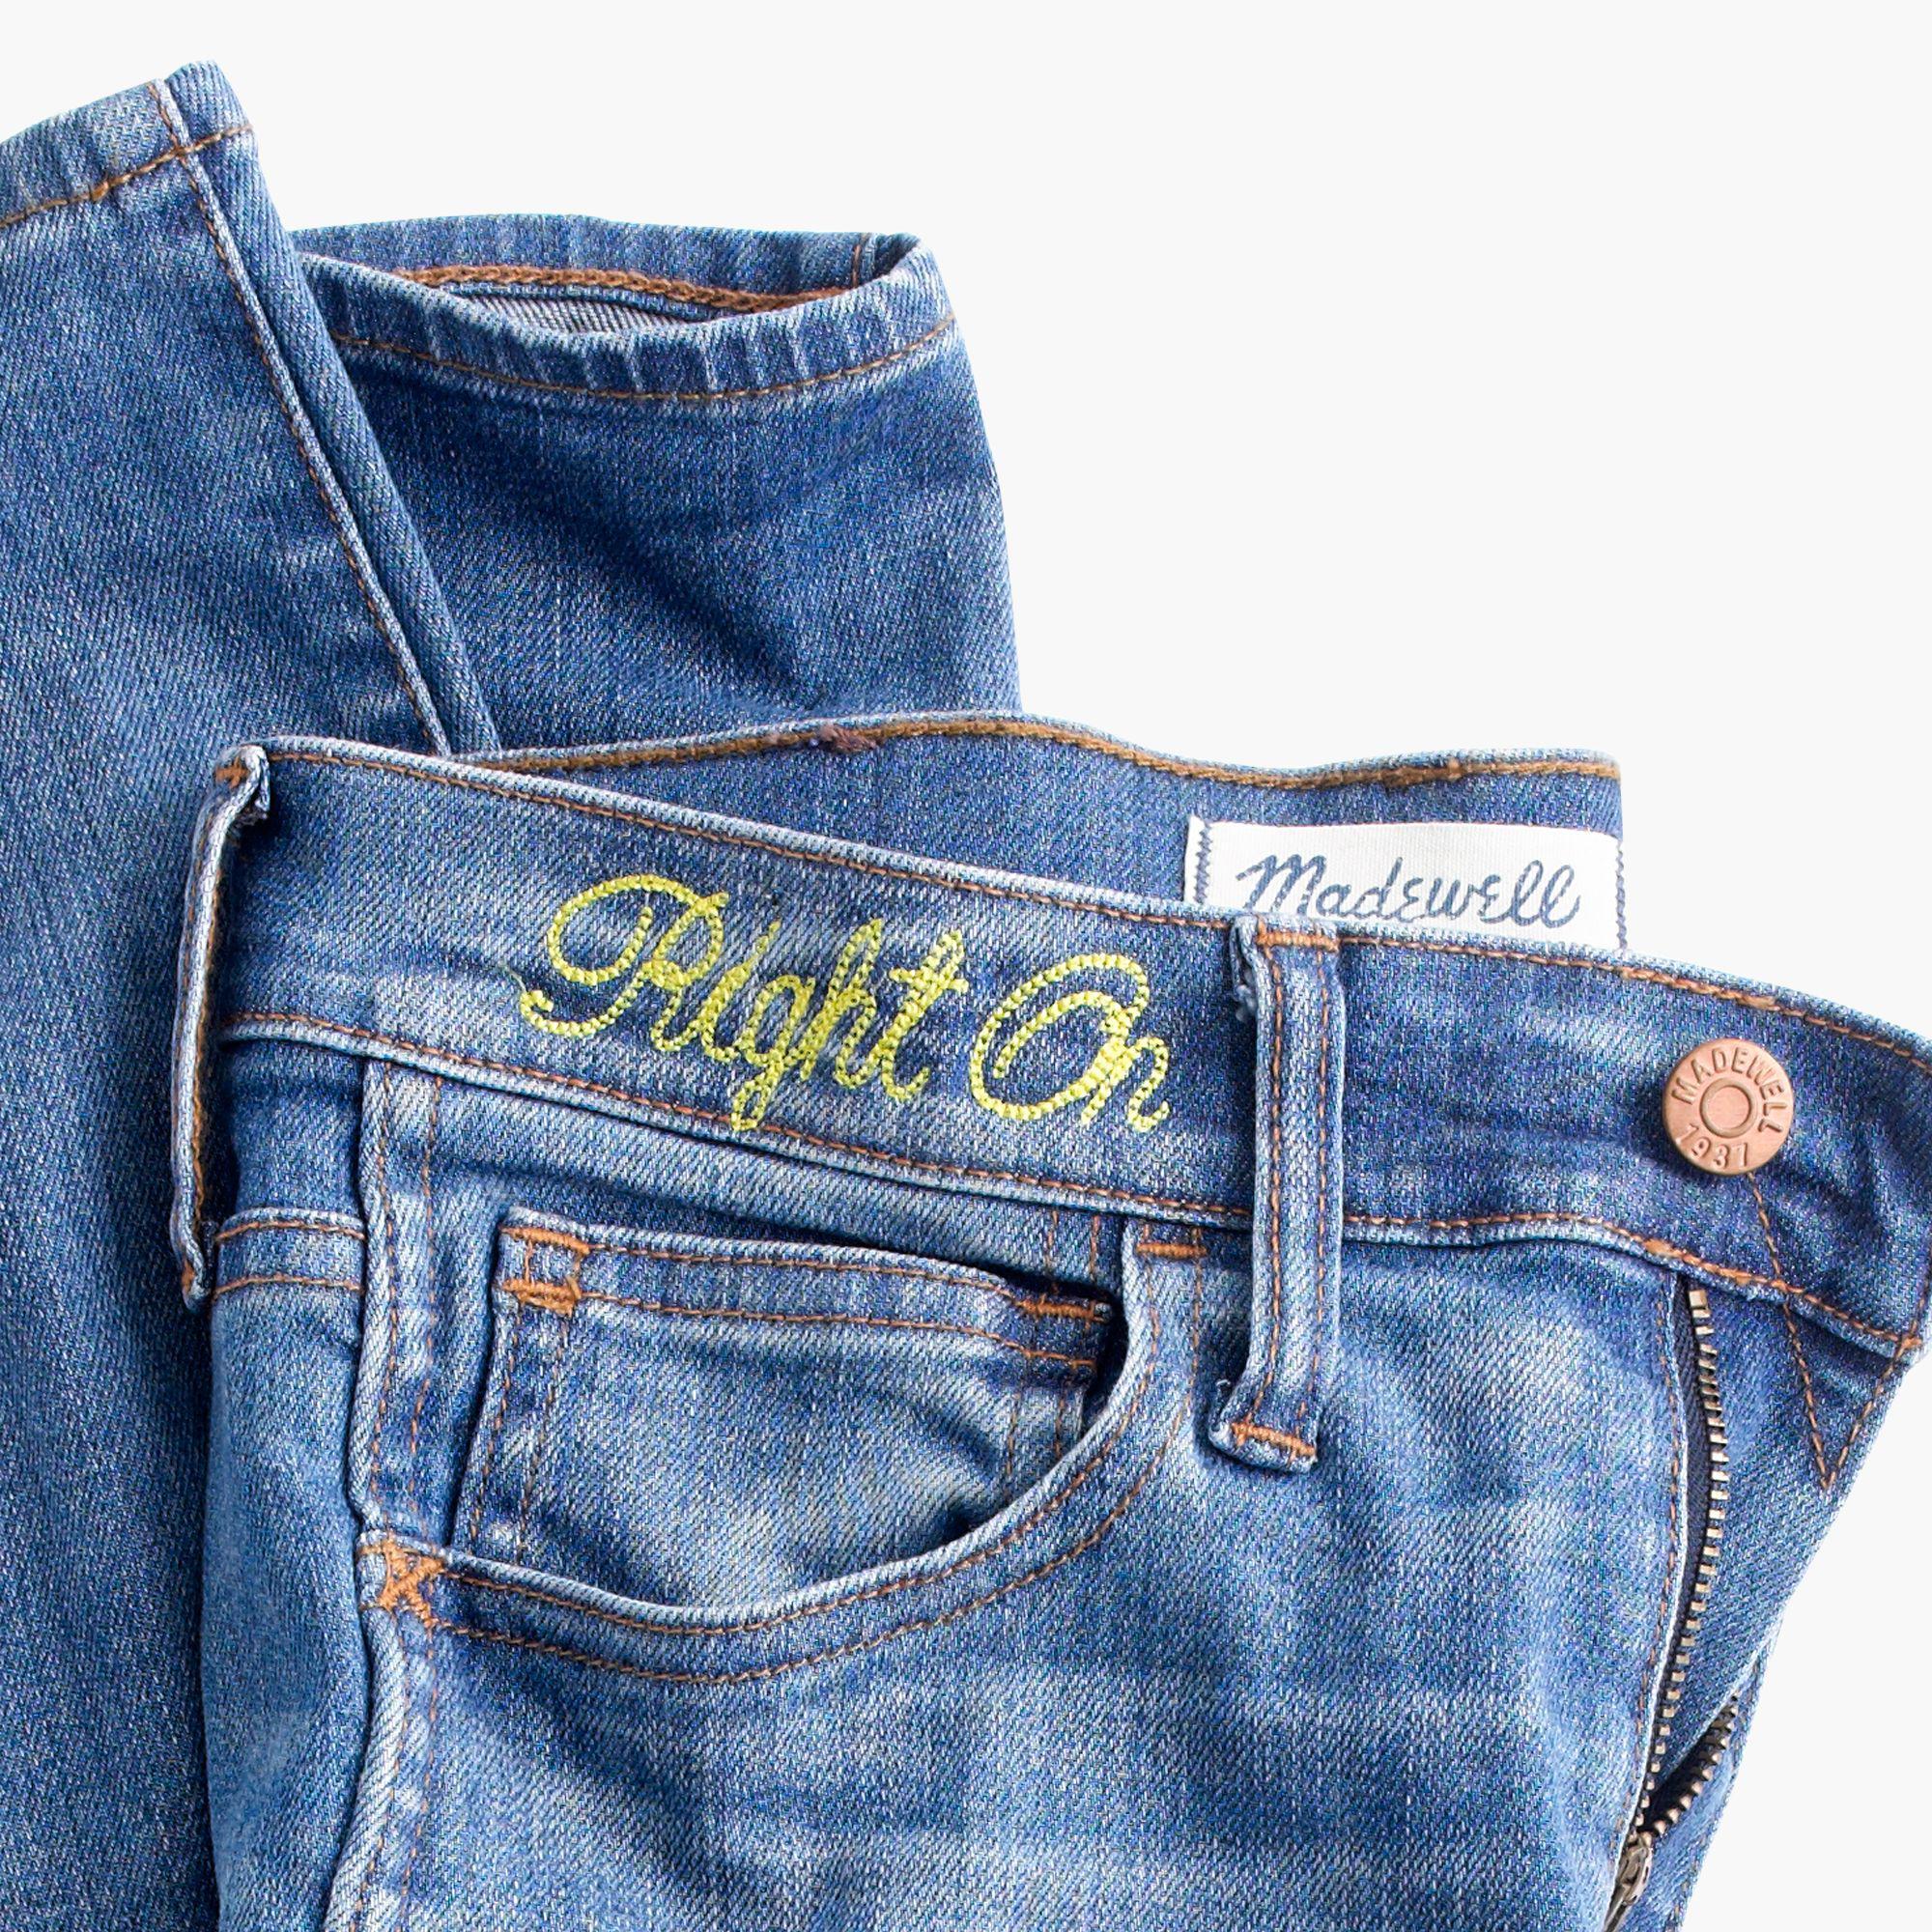 "Madewell Denim 9"" High-rise Skinny Jeans In Hammond Wash: Drop-hem Edition in Blue"